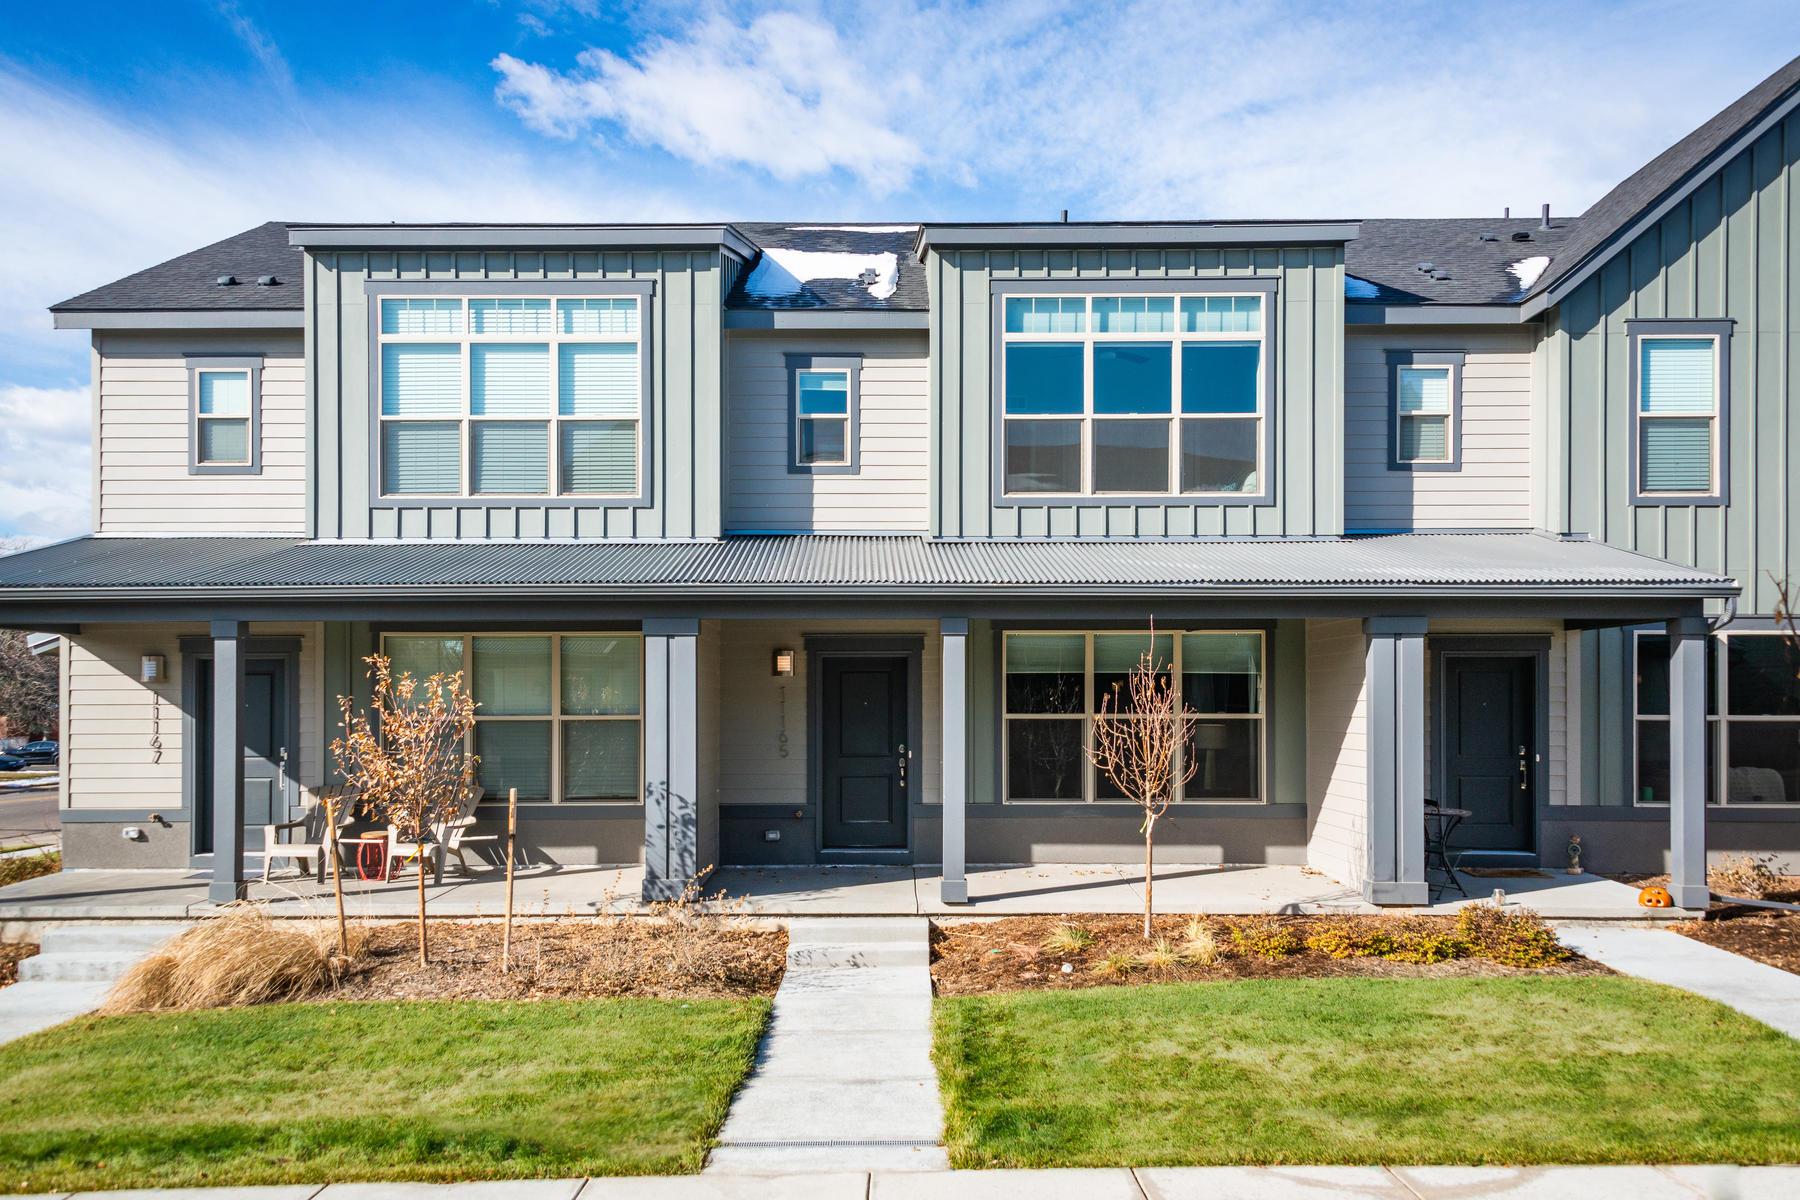 townhouses for Sale at Wonderful Turn-Key Stapleton Row Home 11165 E 25th Avenue Aurora, Colorado 80010 United States